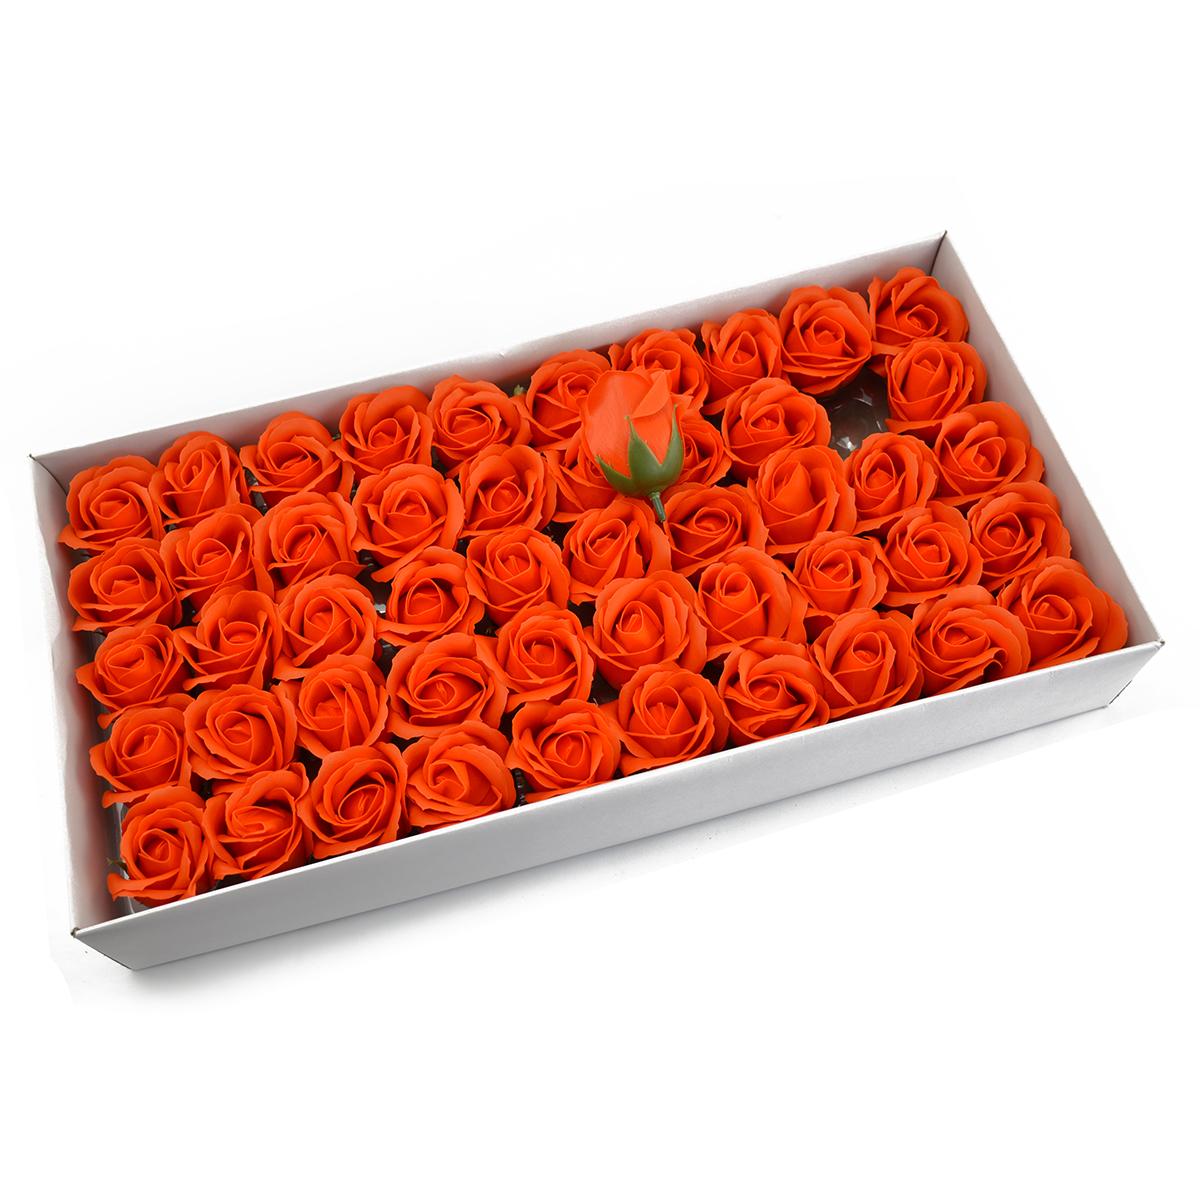 Juego de 50 rosas de jabón aromáticas, toque real, naranja